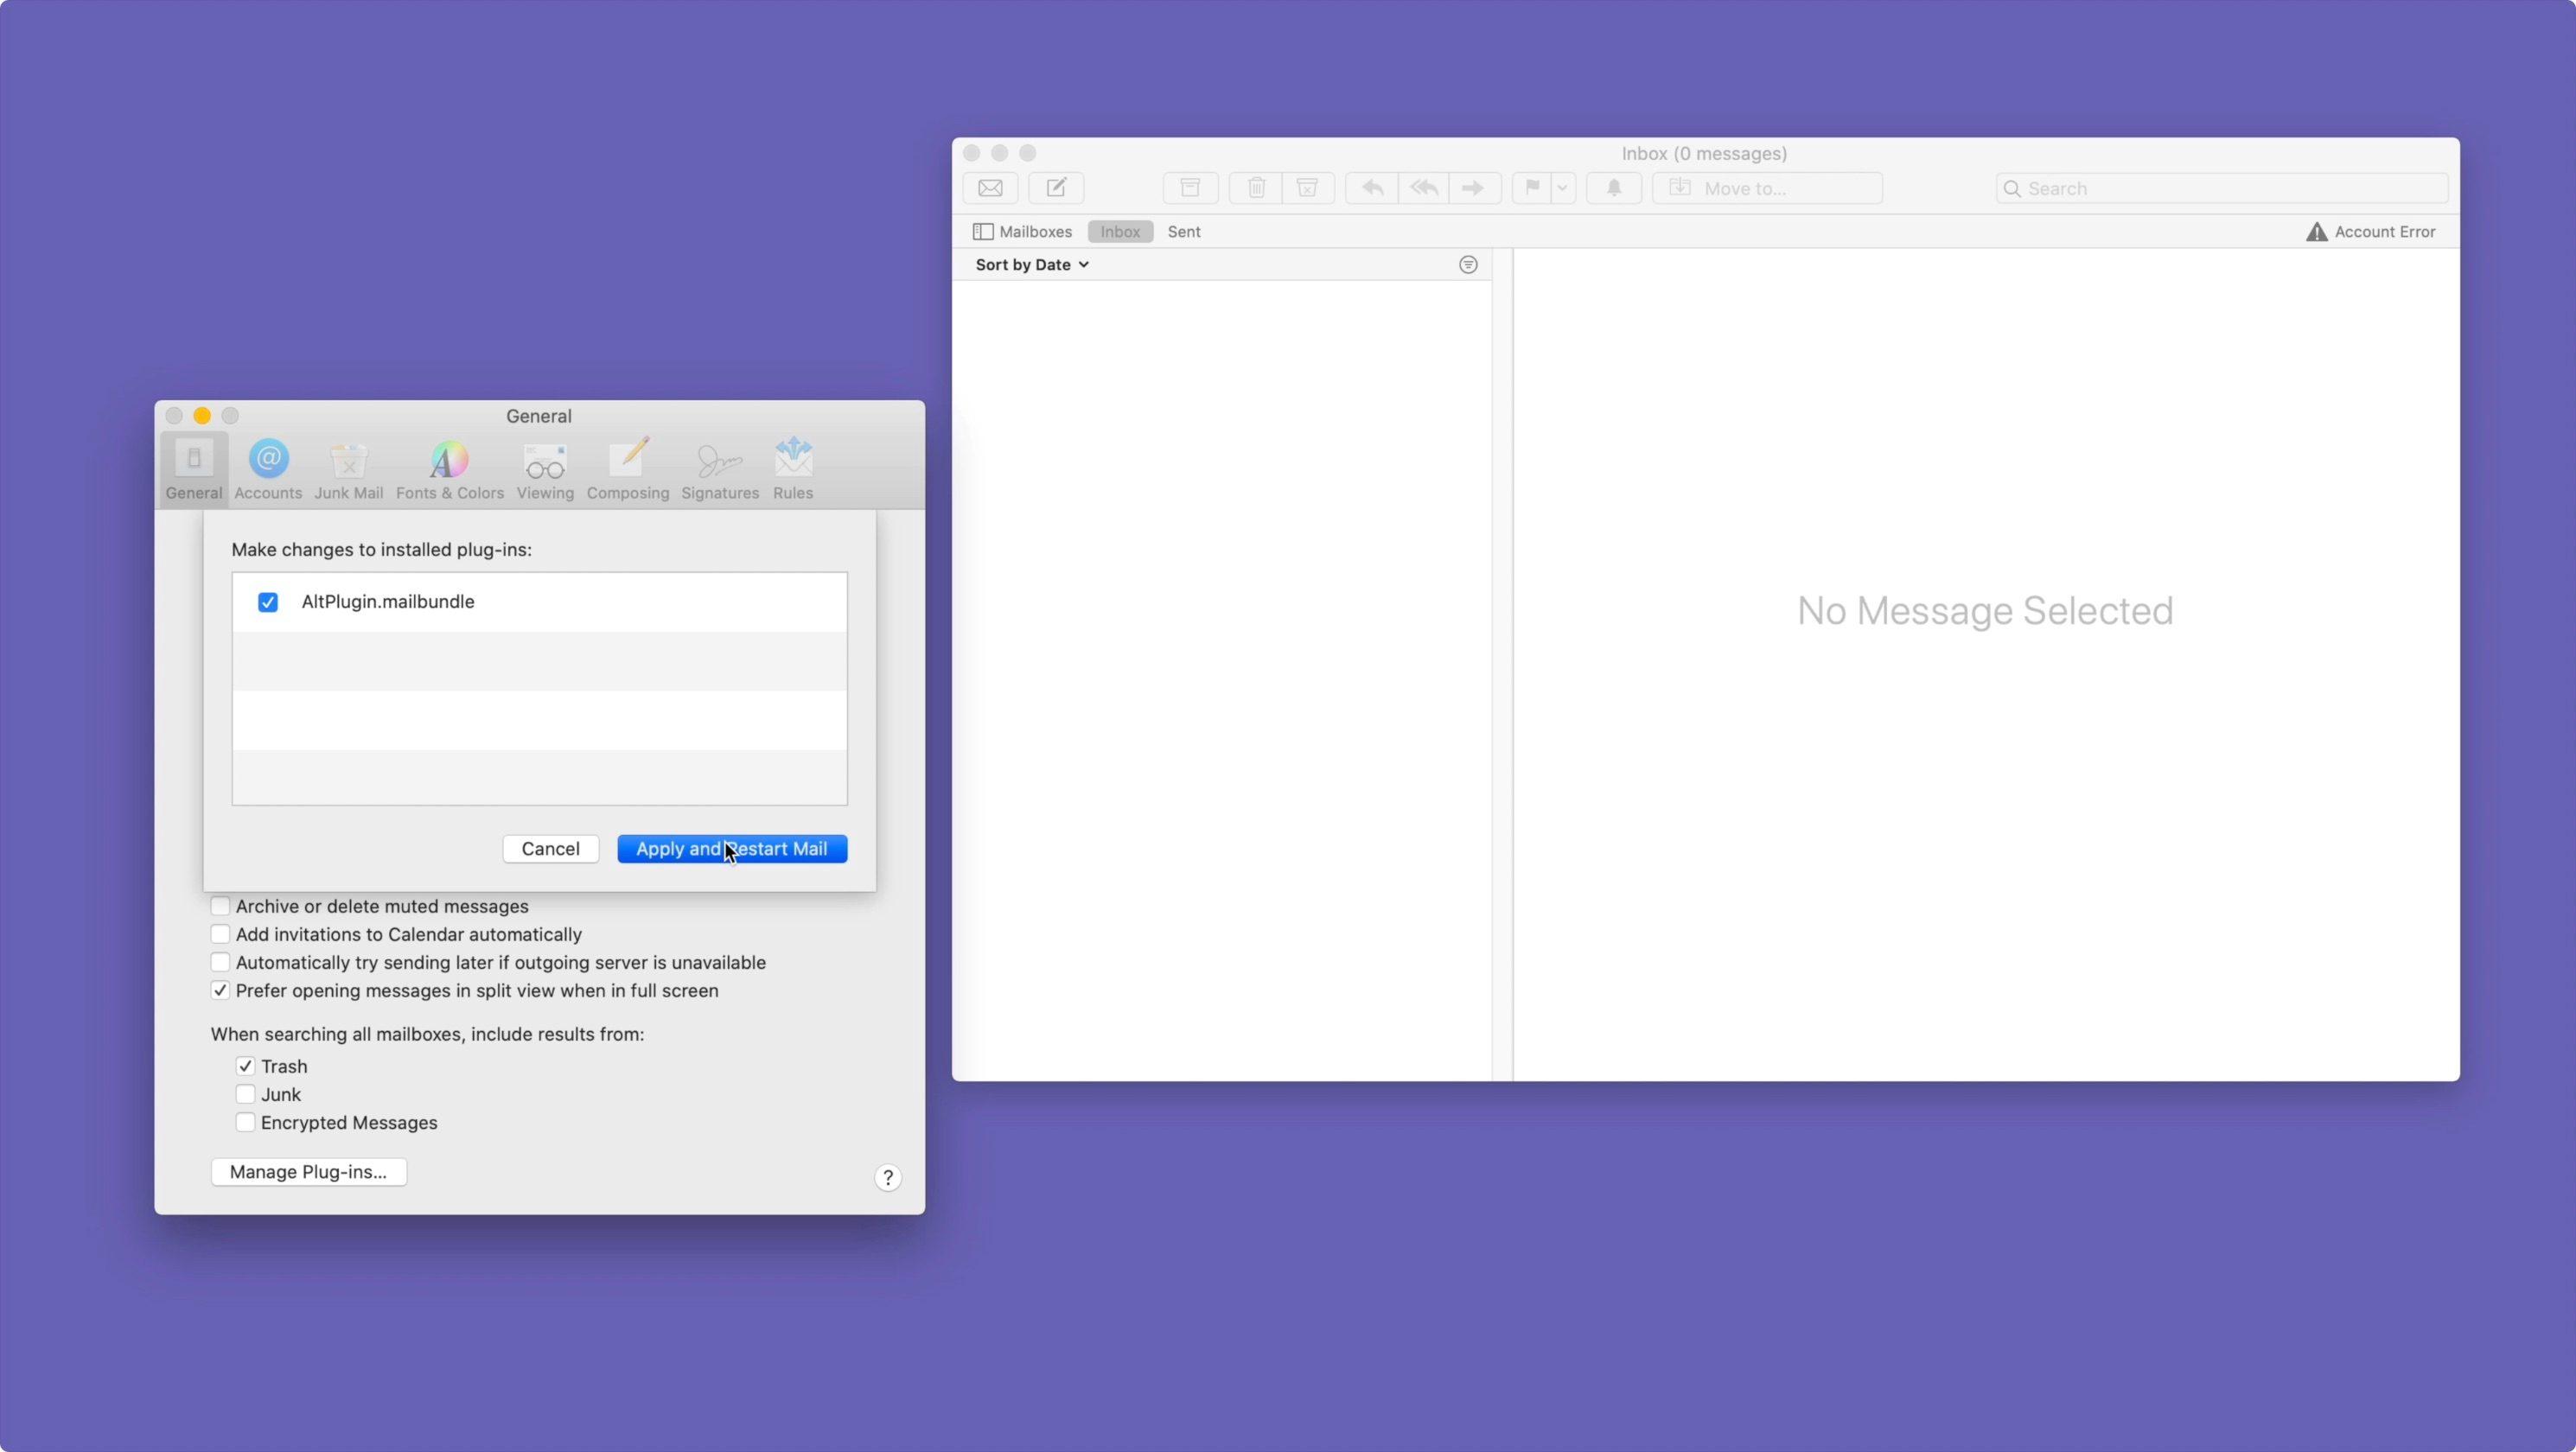 "<span href=""https://9to5mac.com/2020/05/25/how-to-jailbreak-ios-13-5-using-unc0ver-on-macos-video/"">¿Cómo hacer jailbreak a iOS 13.5 utilizando Unc0ver en macOS [Video]</a>"